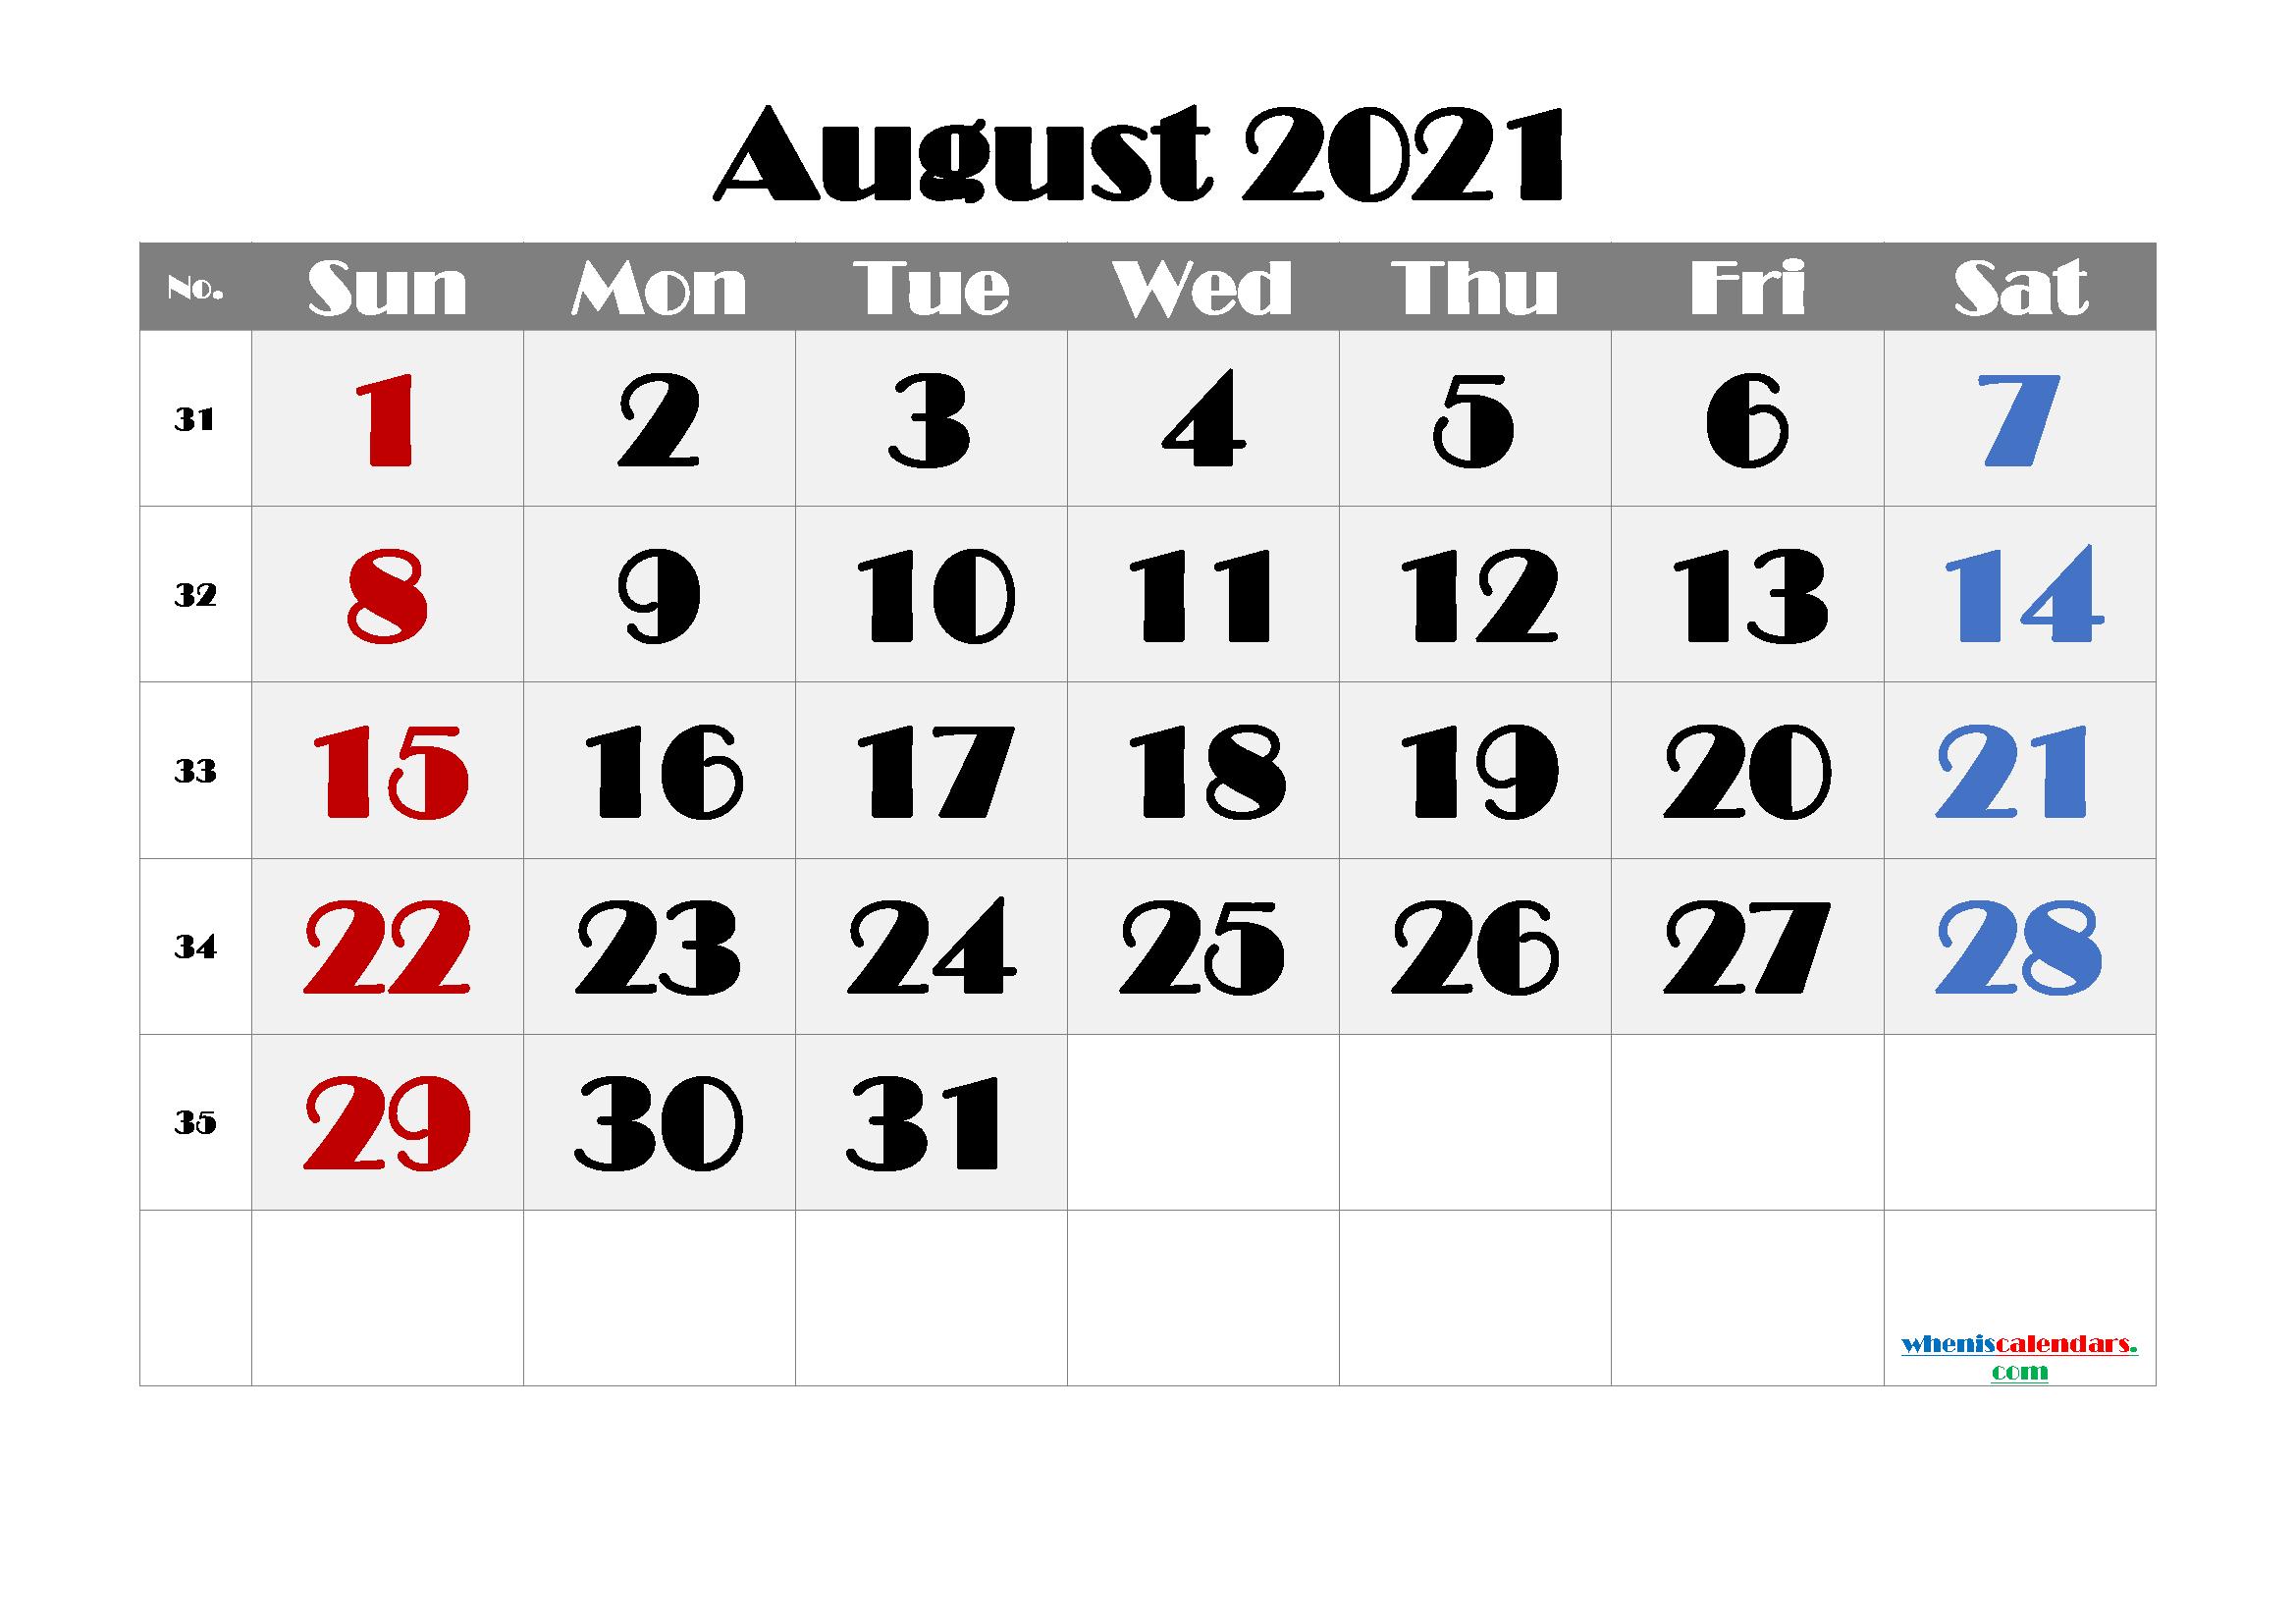 Free Printable Calendar August 2021 2022 And 2023-2021 2022 2023 Printable Calendar